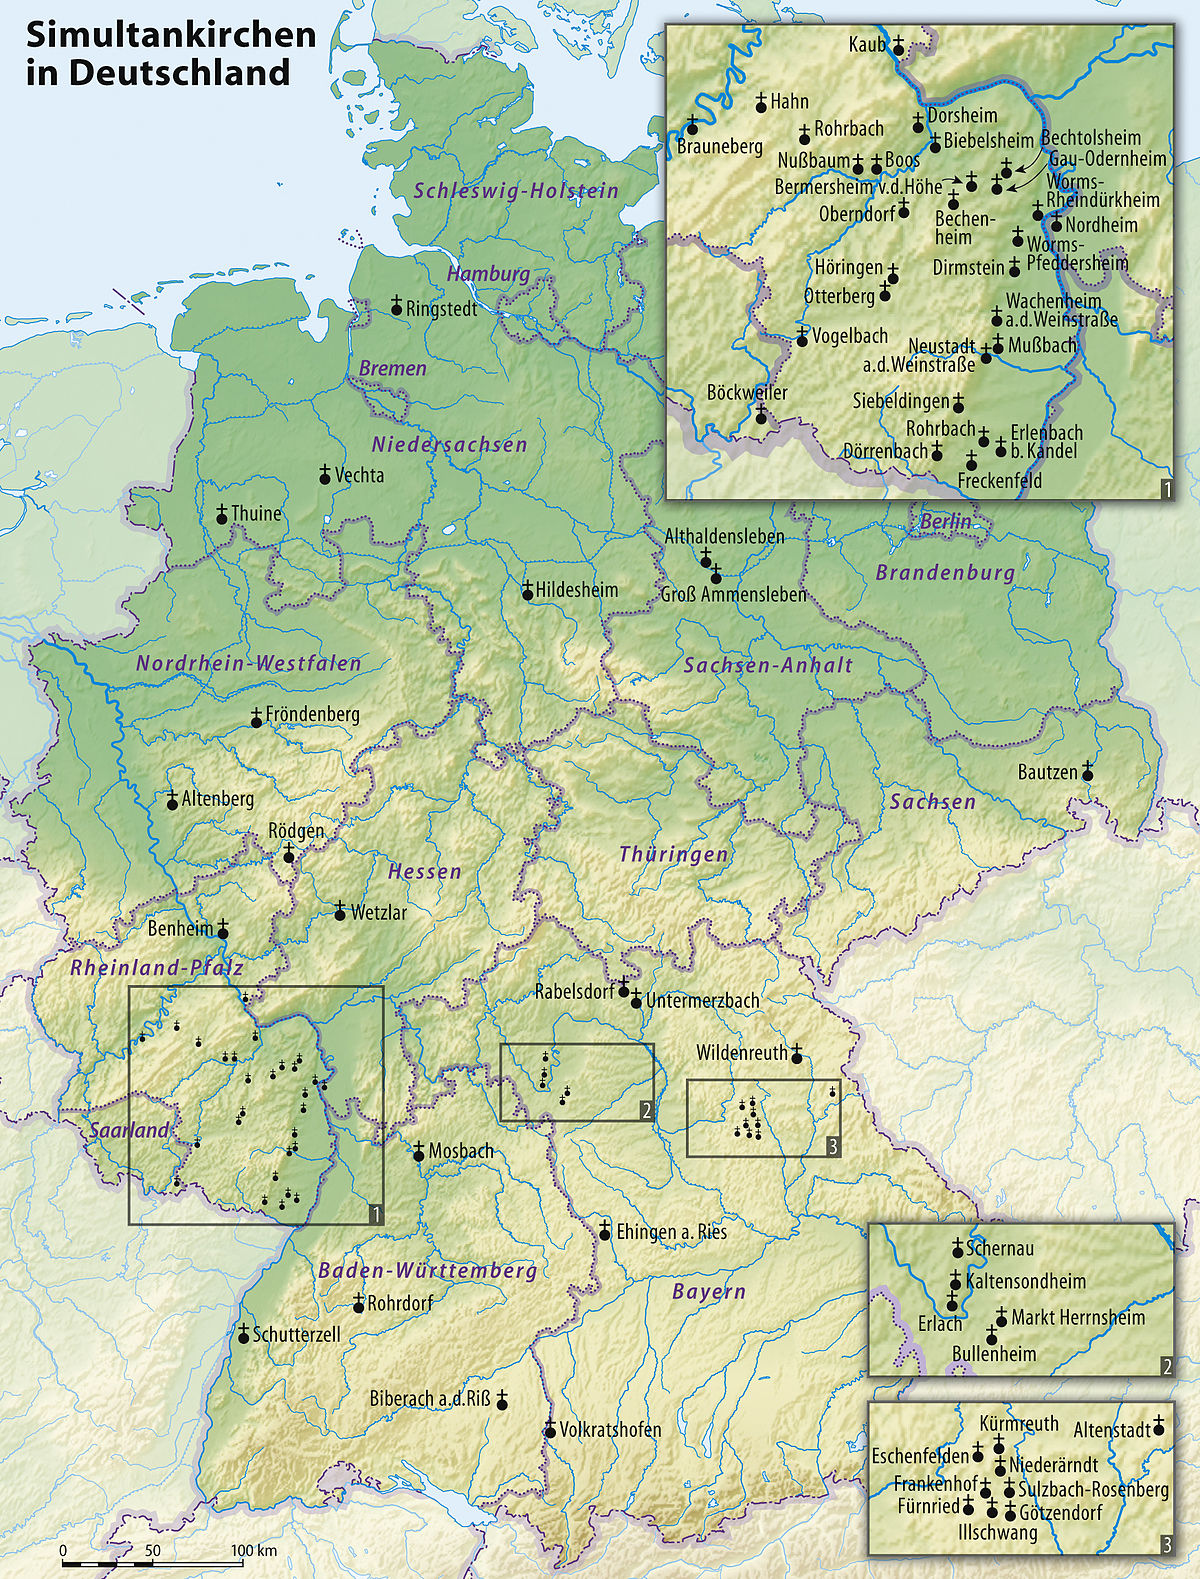 File Karte Simultankirchen Deutschland Jpg Wikimedia Commons